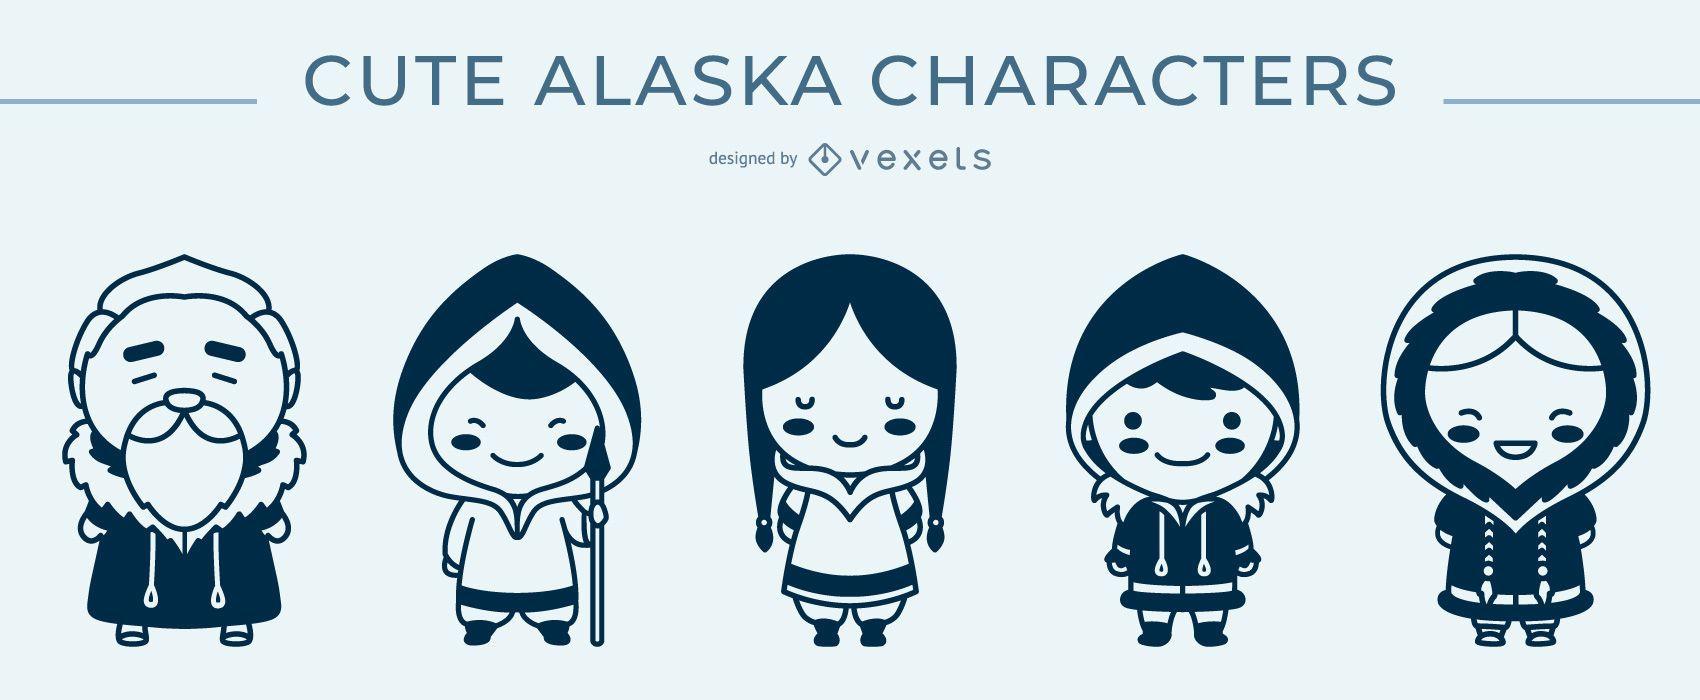 Paquete monocromo de personajes lindos de Alaska